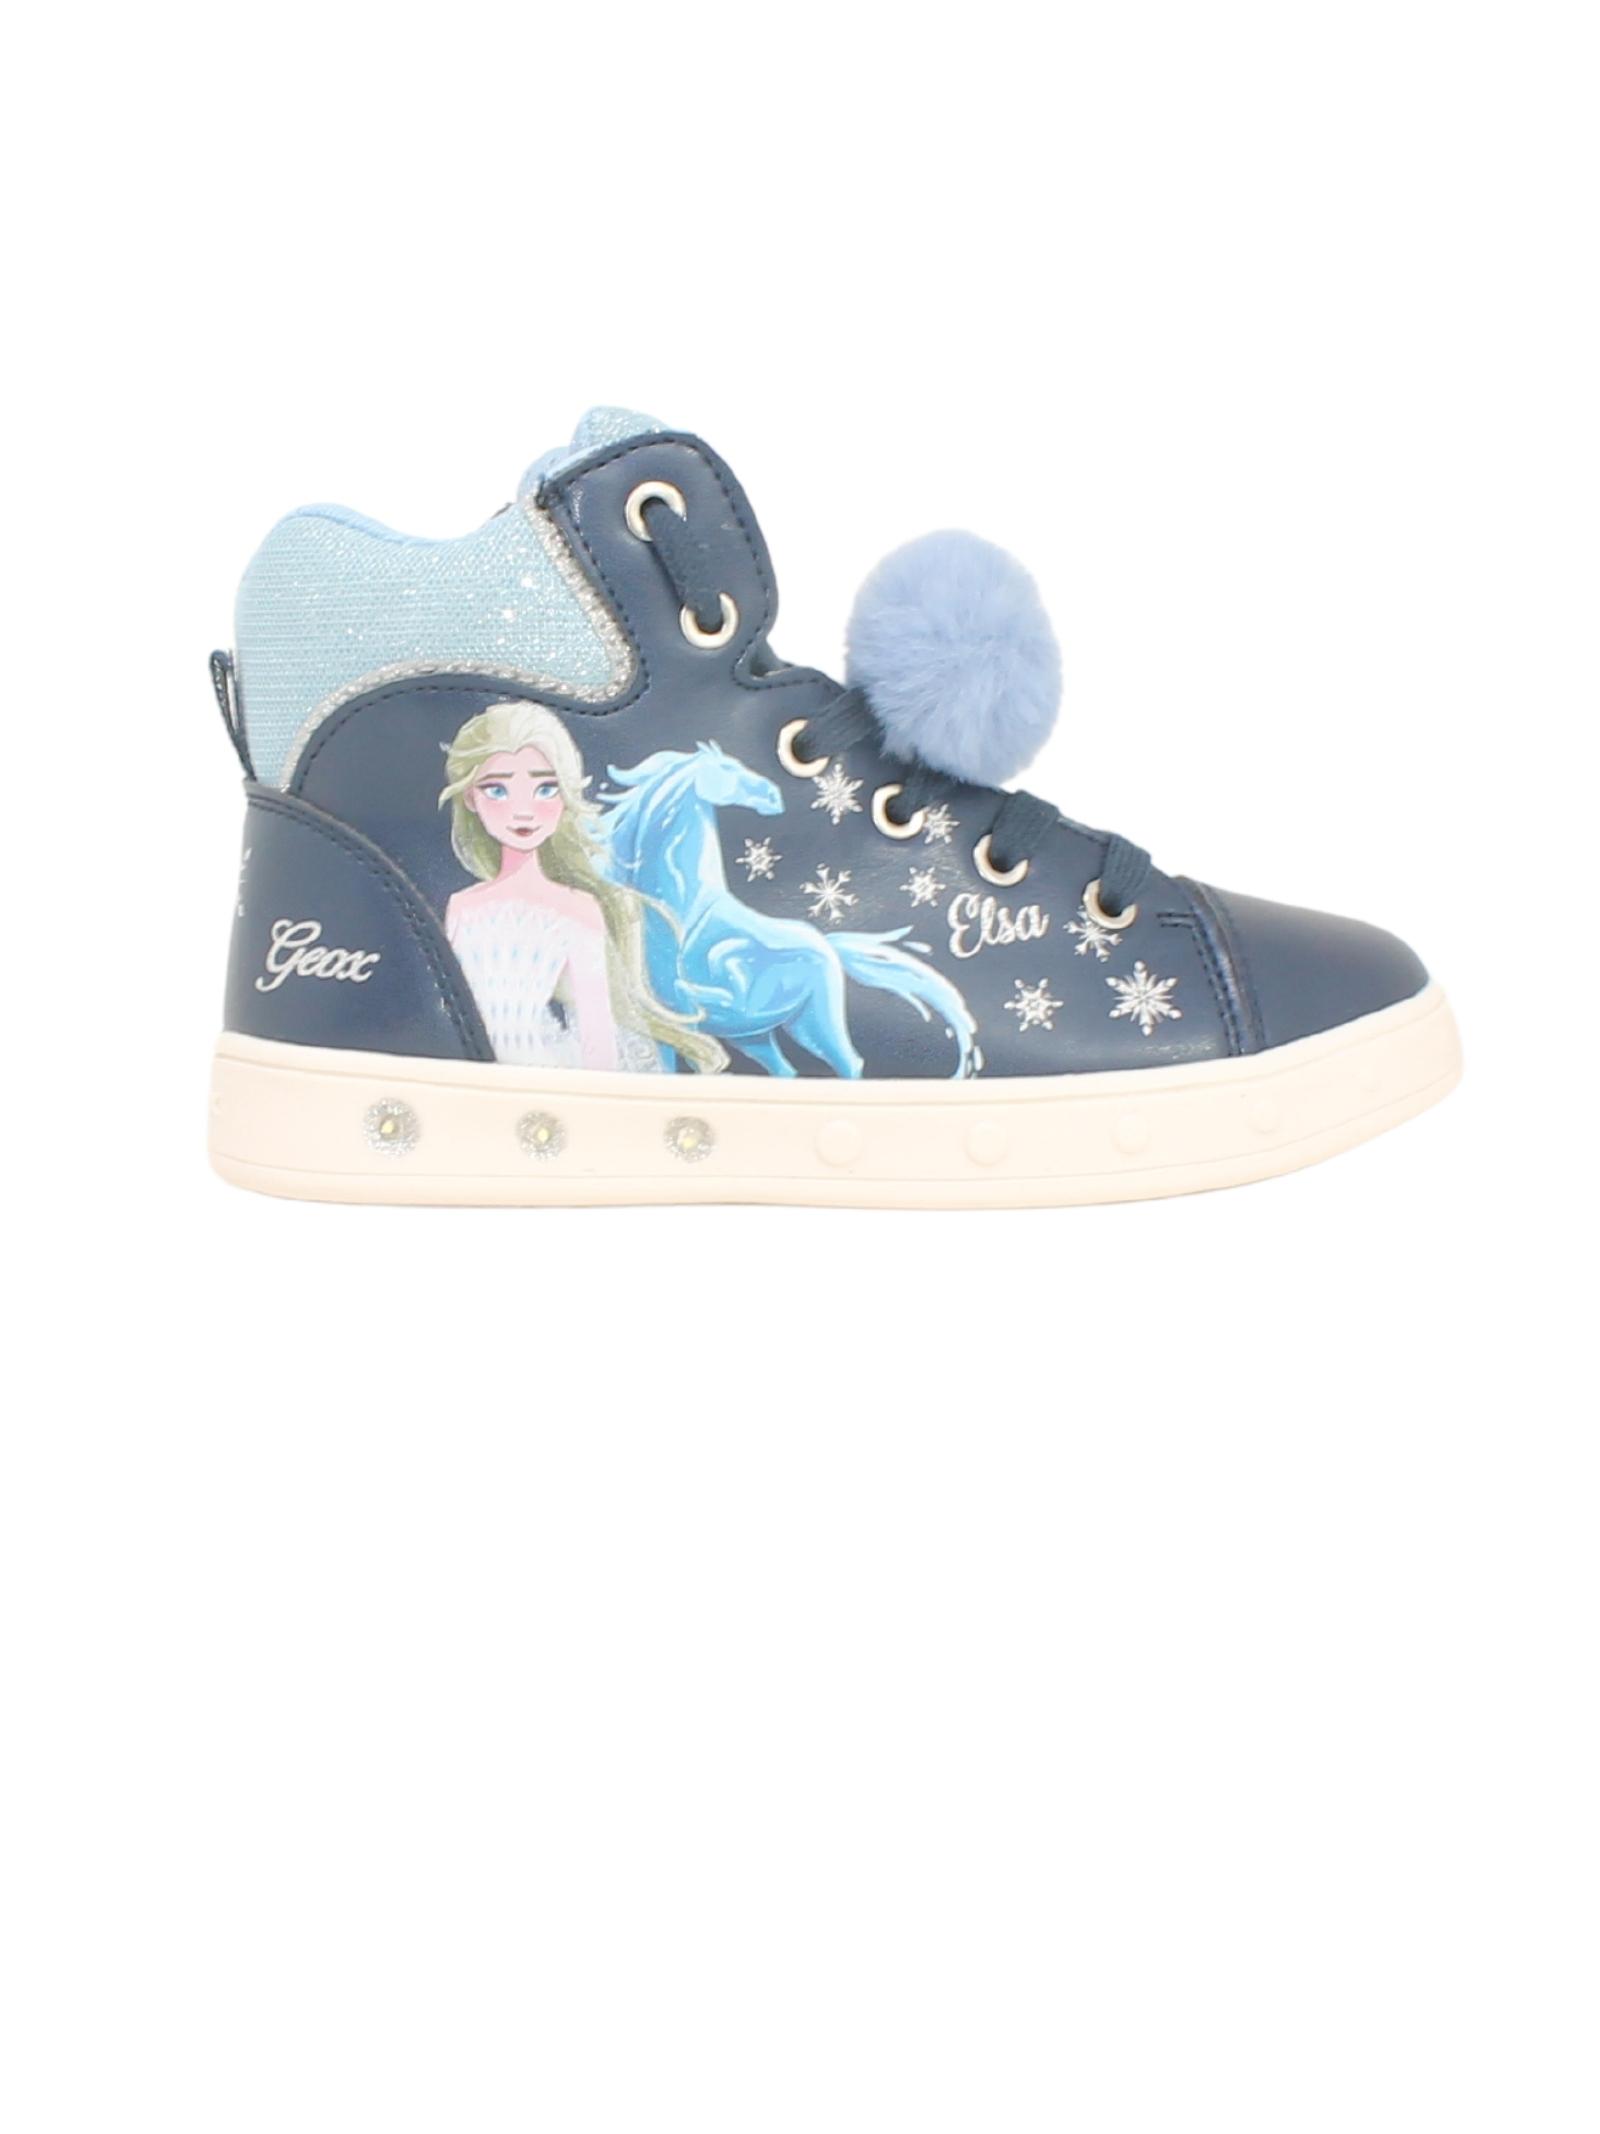 Sneakers Princess Pon Pon Bambina GEOX KIDS   Sneakers   J168WC000NFC4231